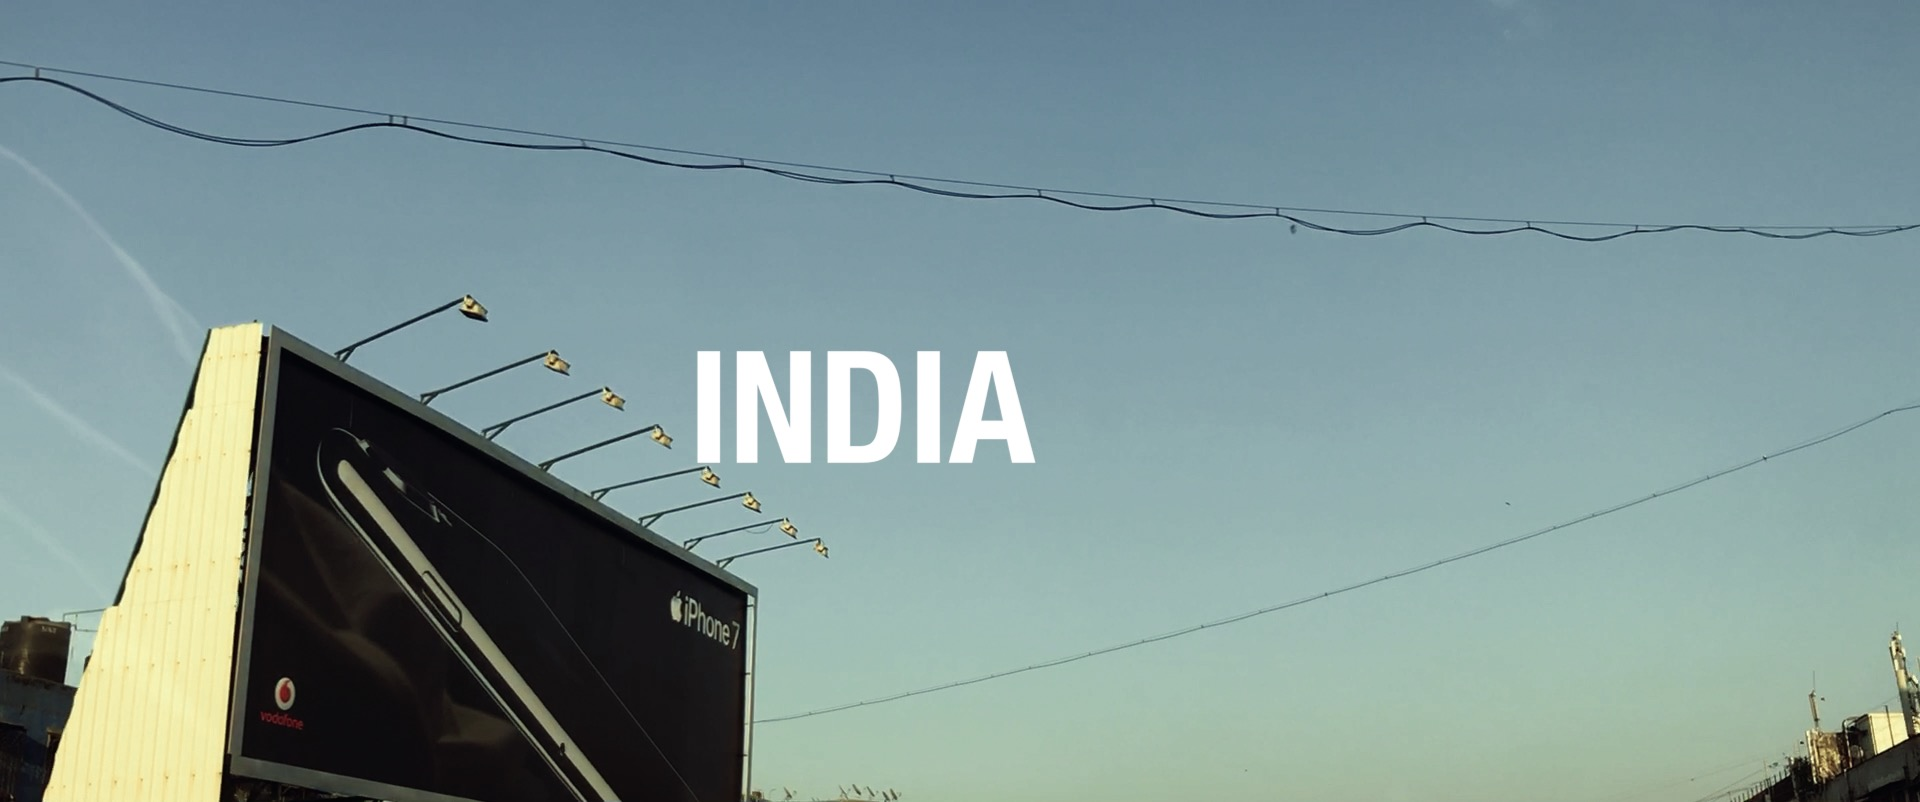 INDIA_LAYOUT_V2_06.jpg